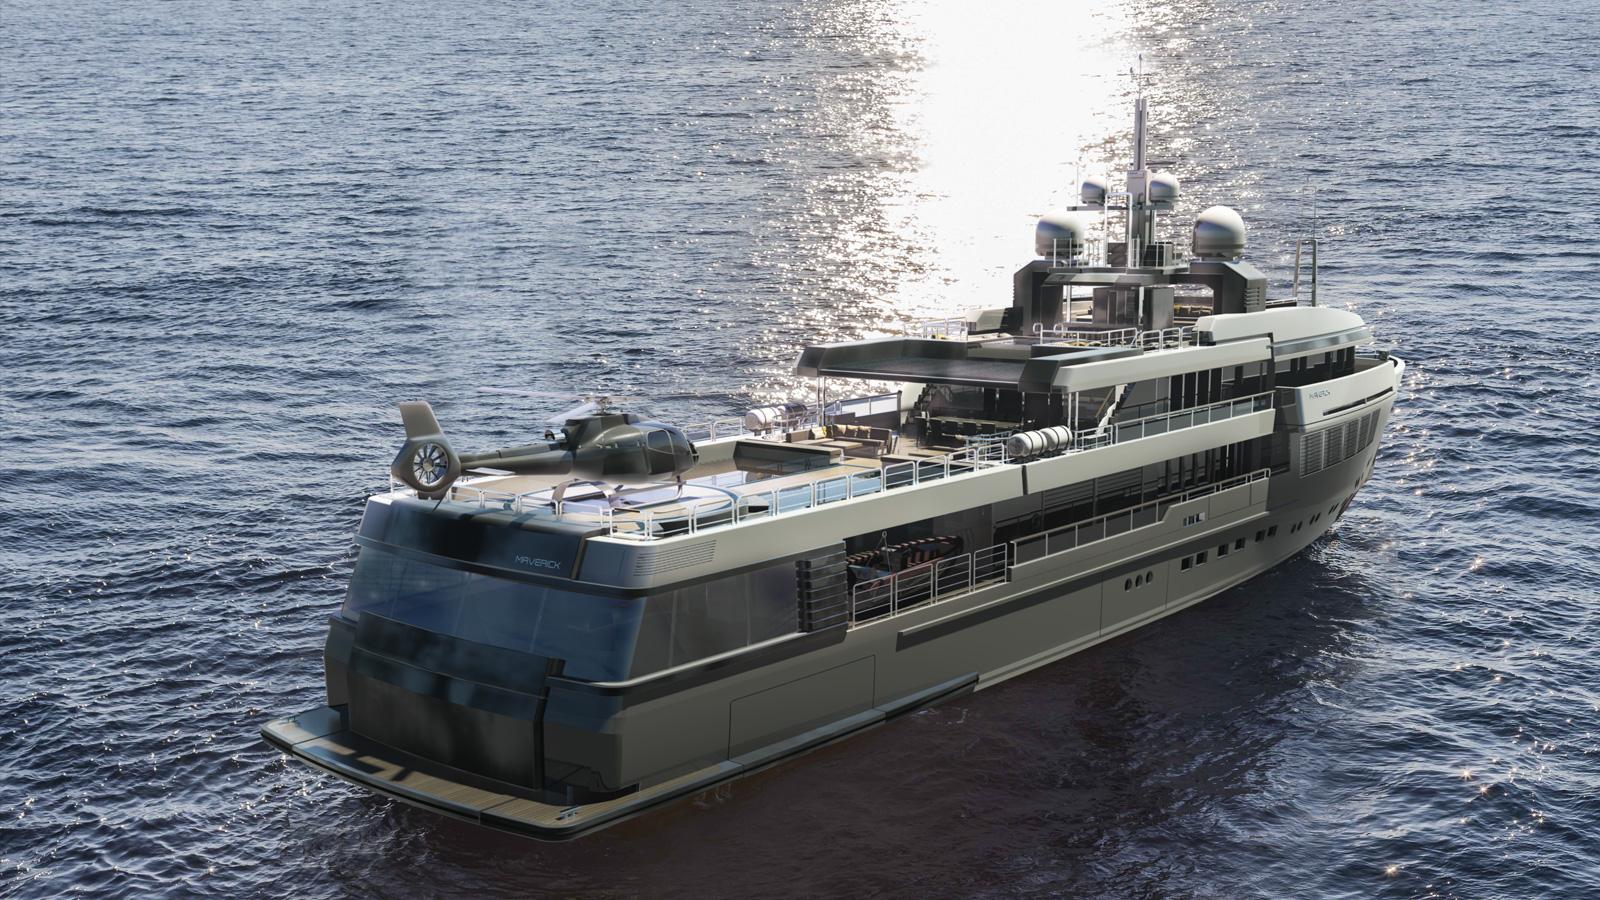 aft-view-of-the-rossinavi-explorer-yacht-concept-maverick-55